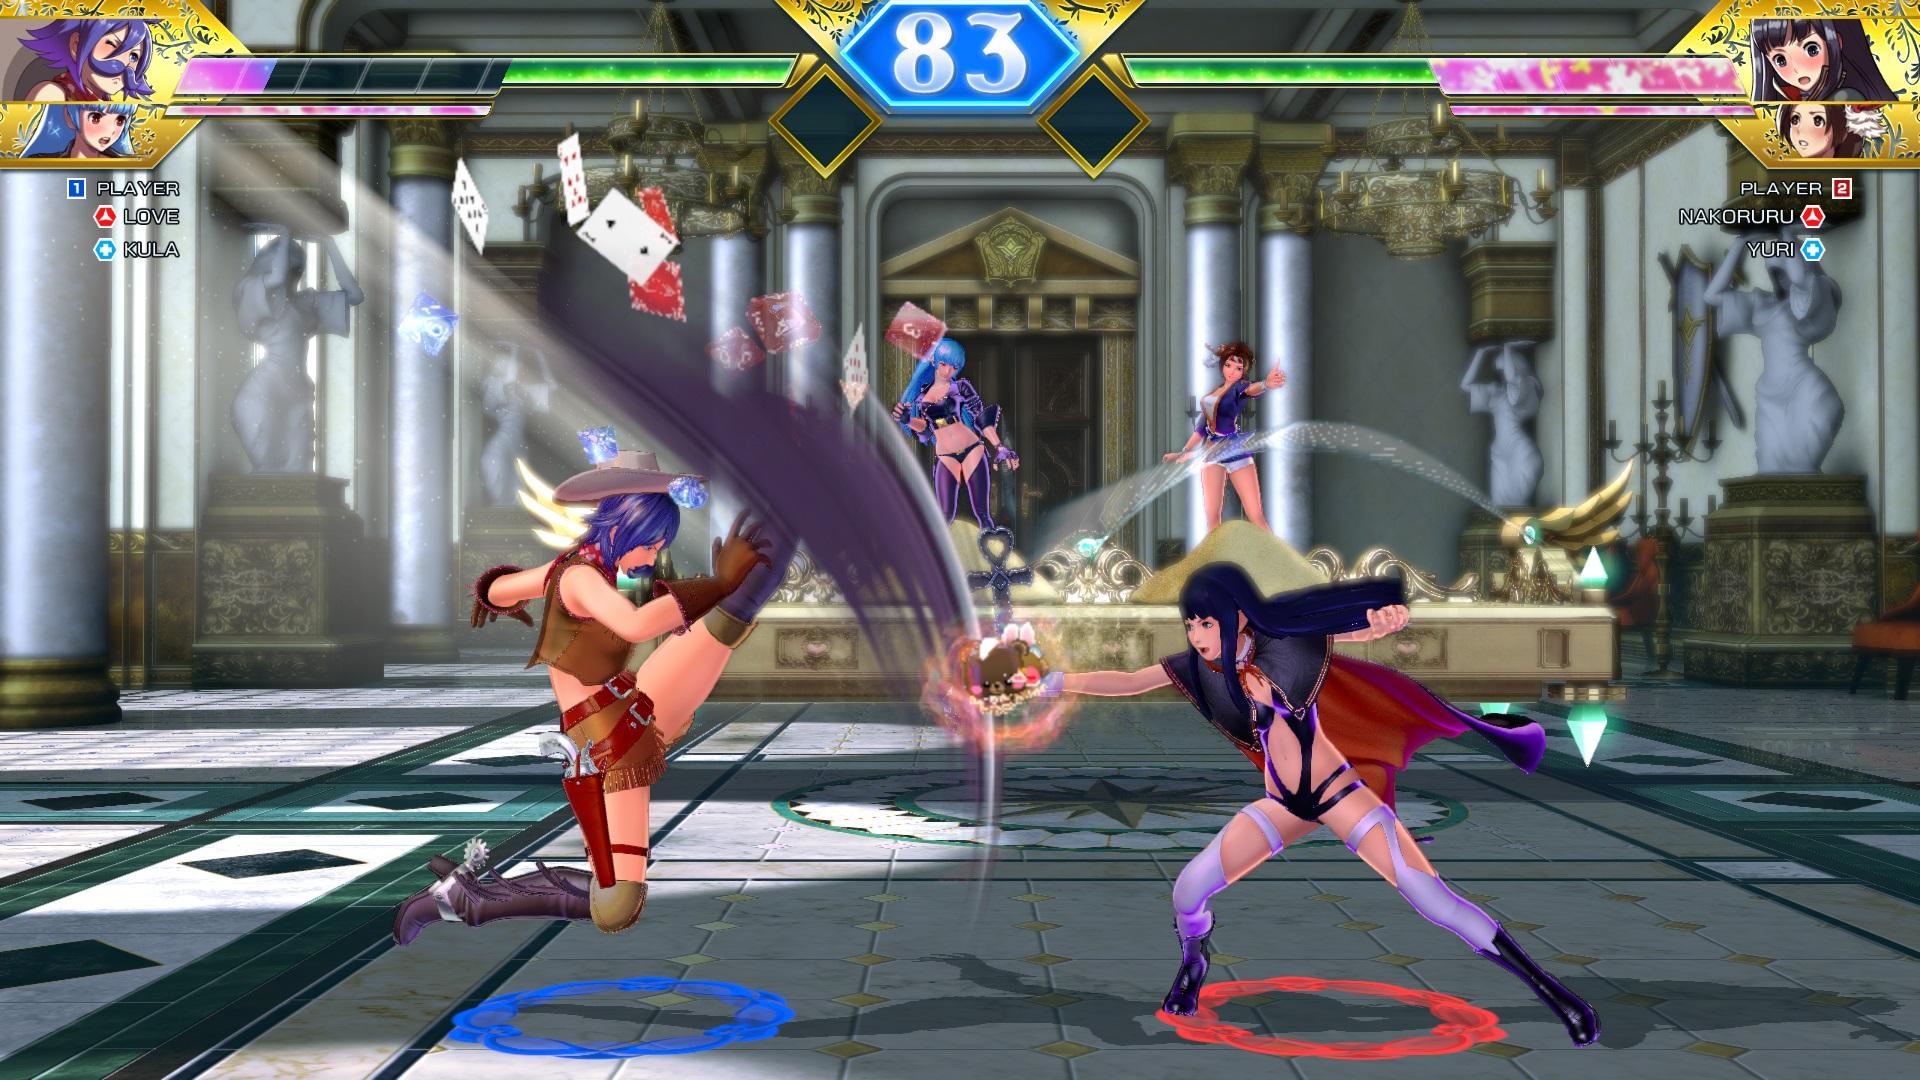 snk-heroines-tag-team-frenzy-pc-screenshot-4